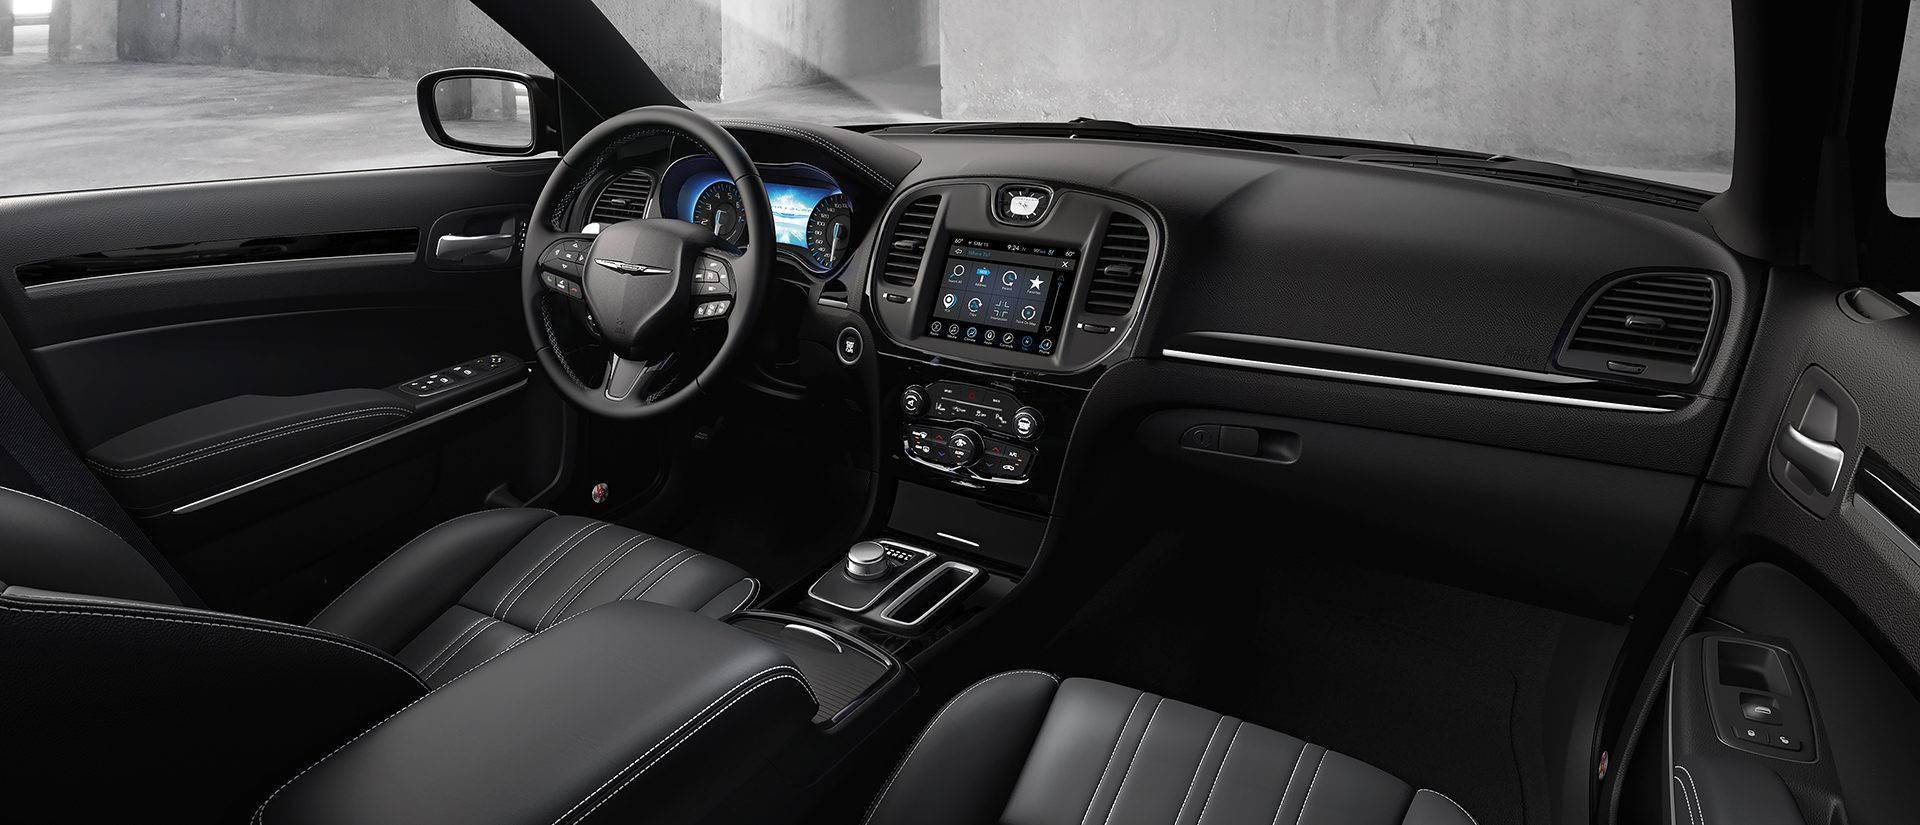 Great 2017 Chrysler 300 Interior Hero.image.1920